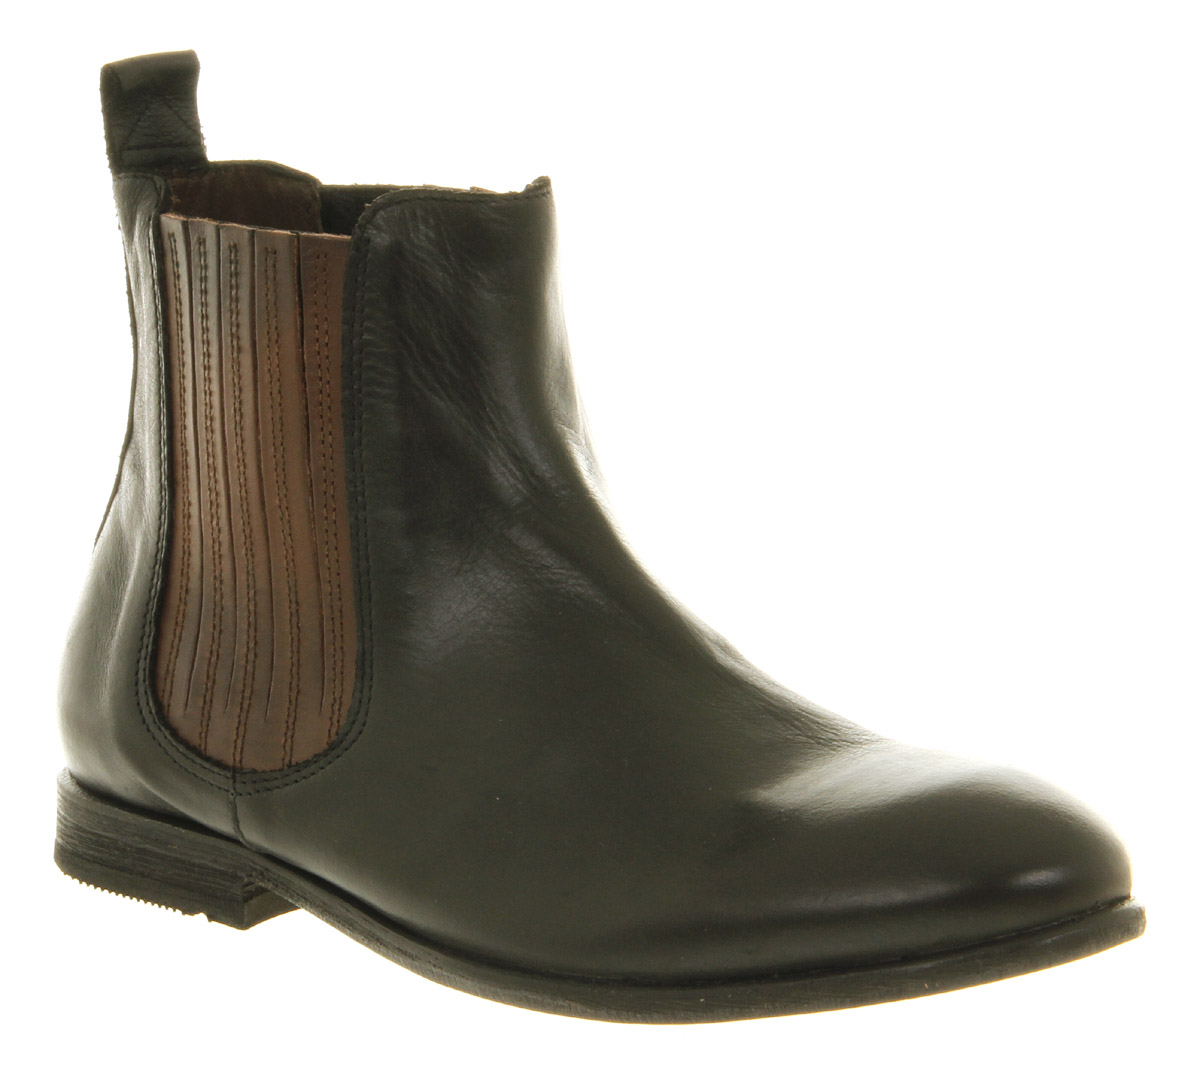 h by hudson chelsea boot in brown black lyst. Black Bedroom Furniture Sets. Home Design Ideas